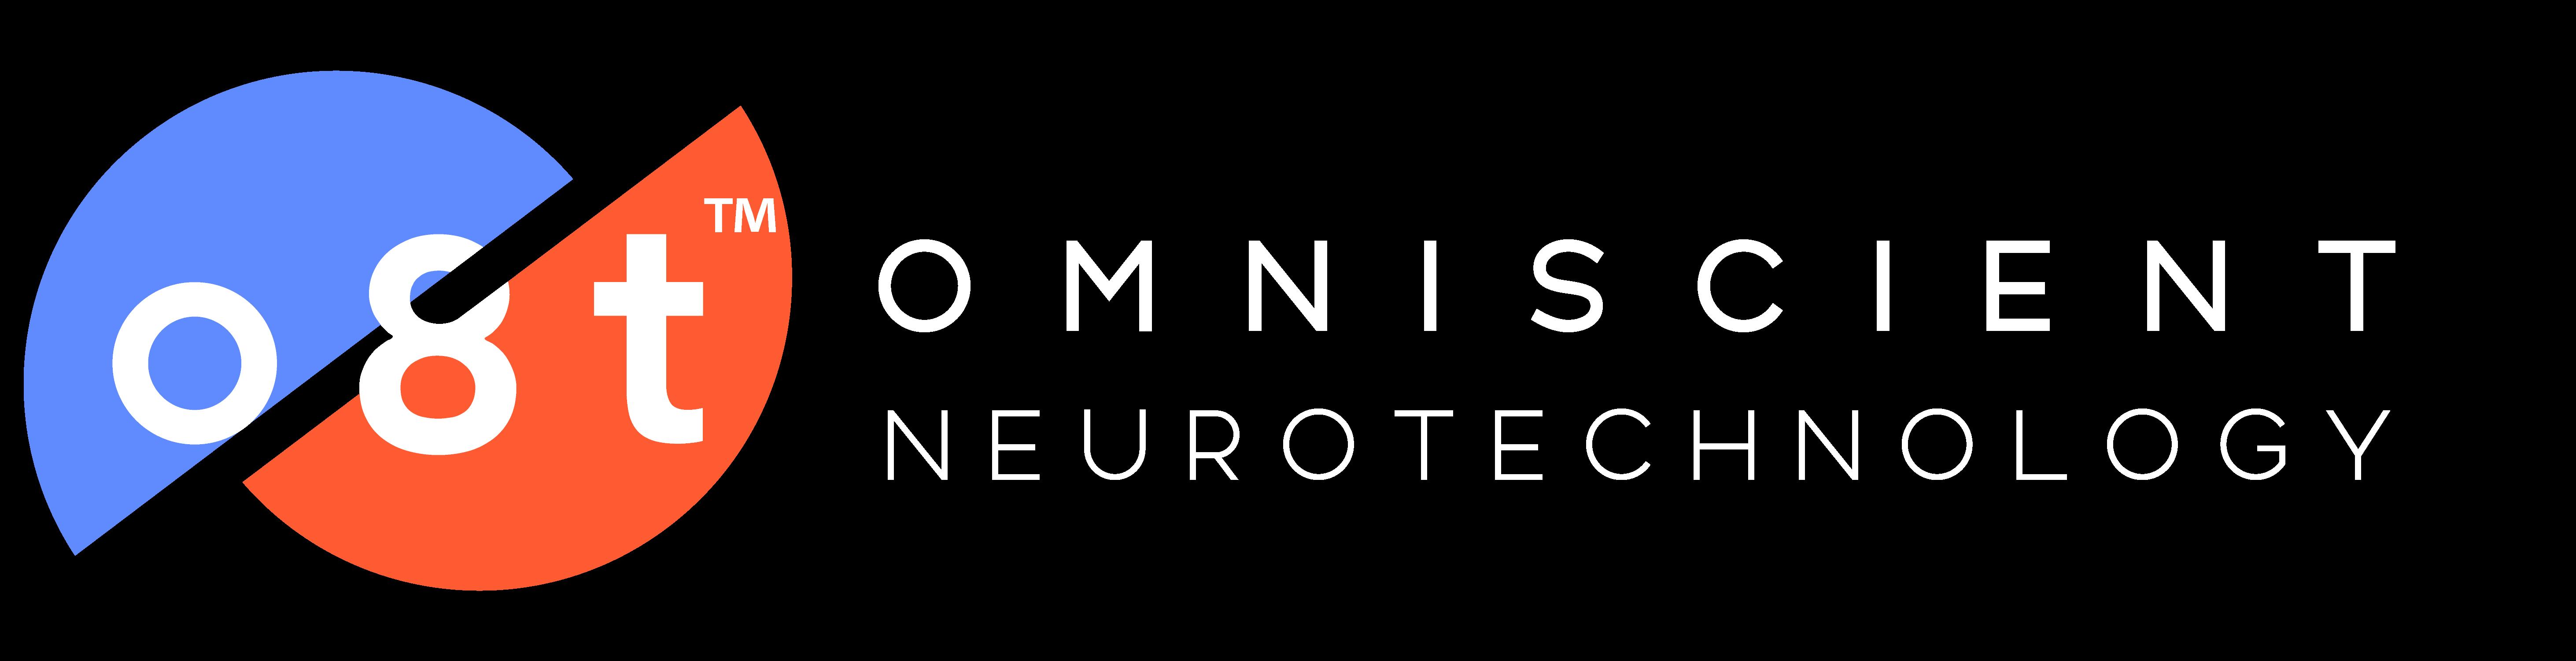 o8t_omniscient_Logo_RGB_Horizontal_1